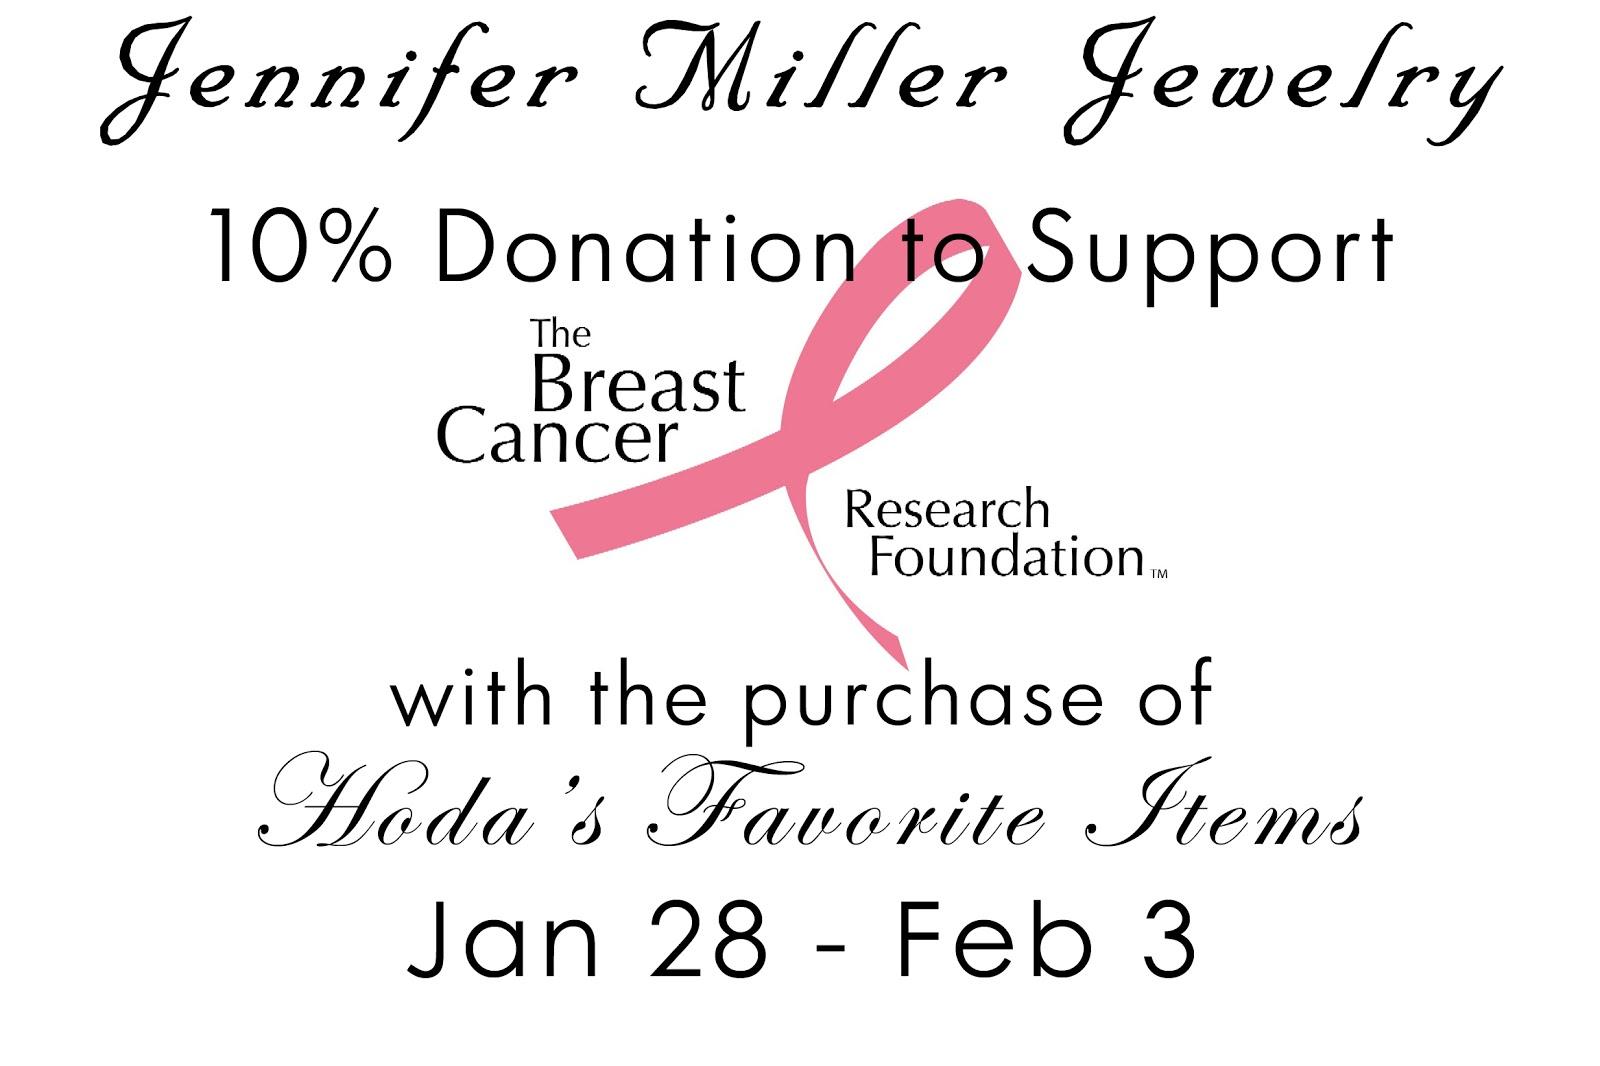 Living Meet Hoda Kotb At Jennifer Miller Jewelry This Saay